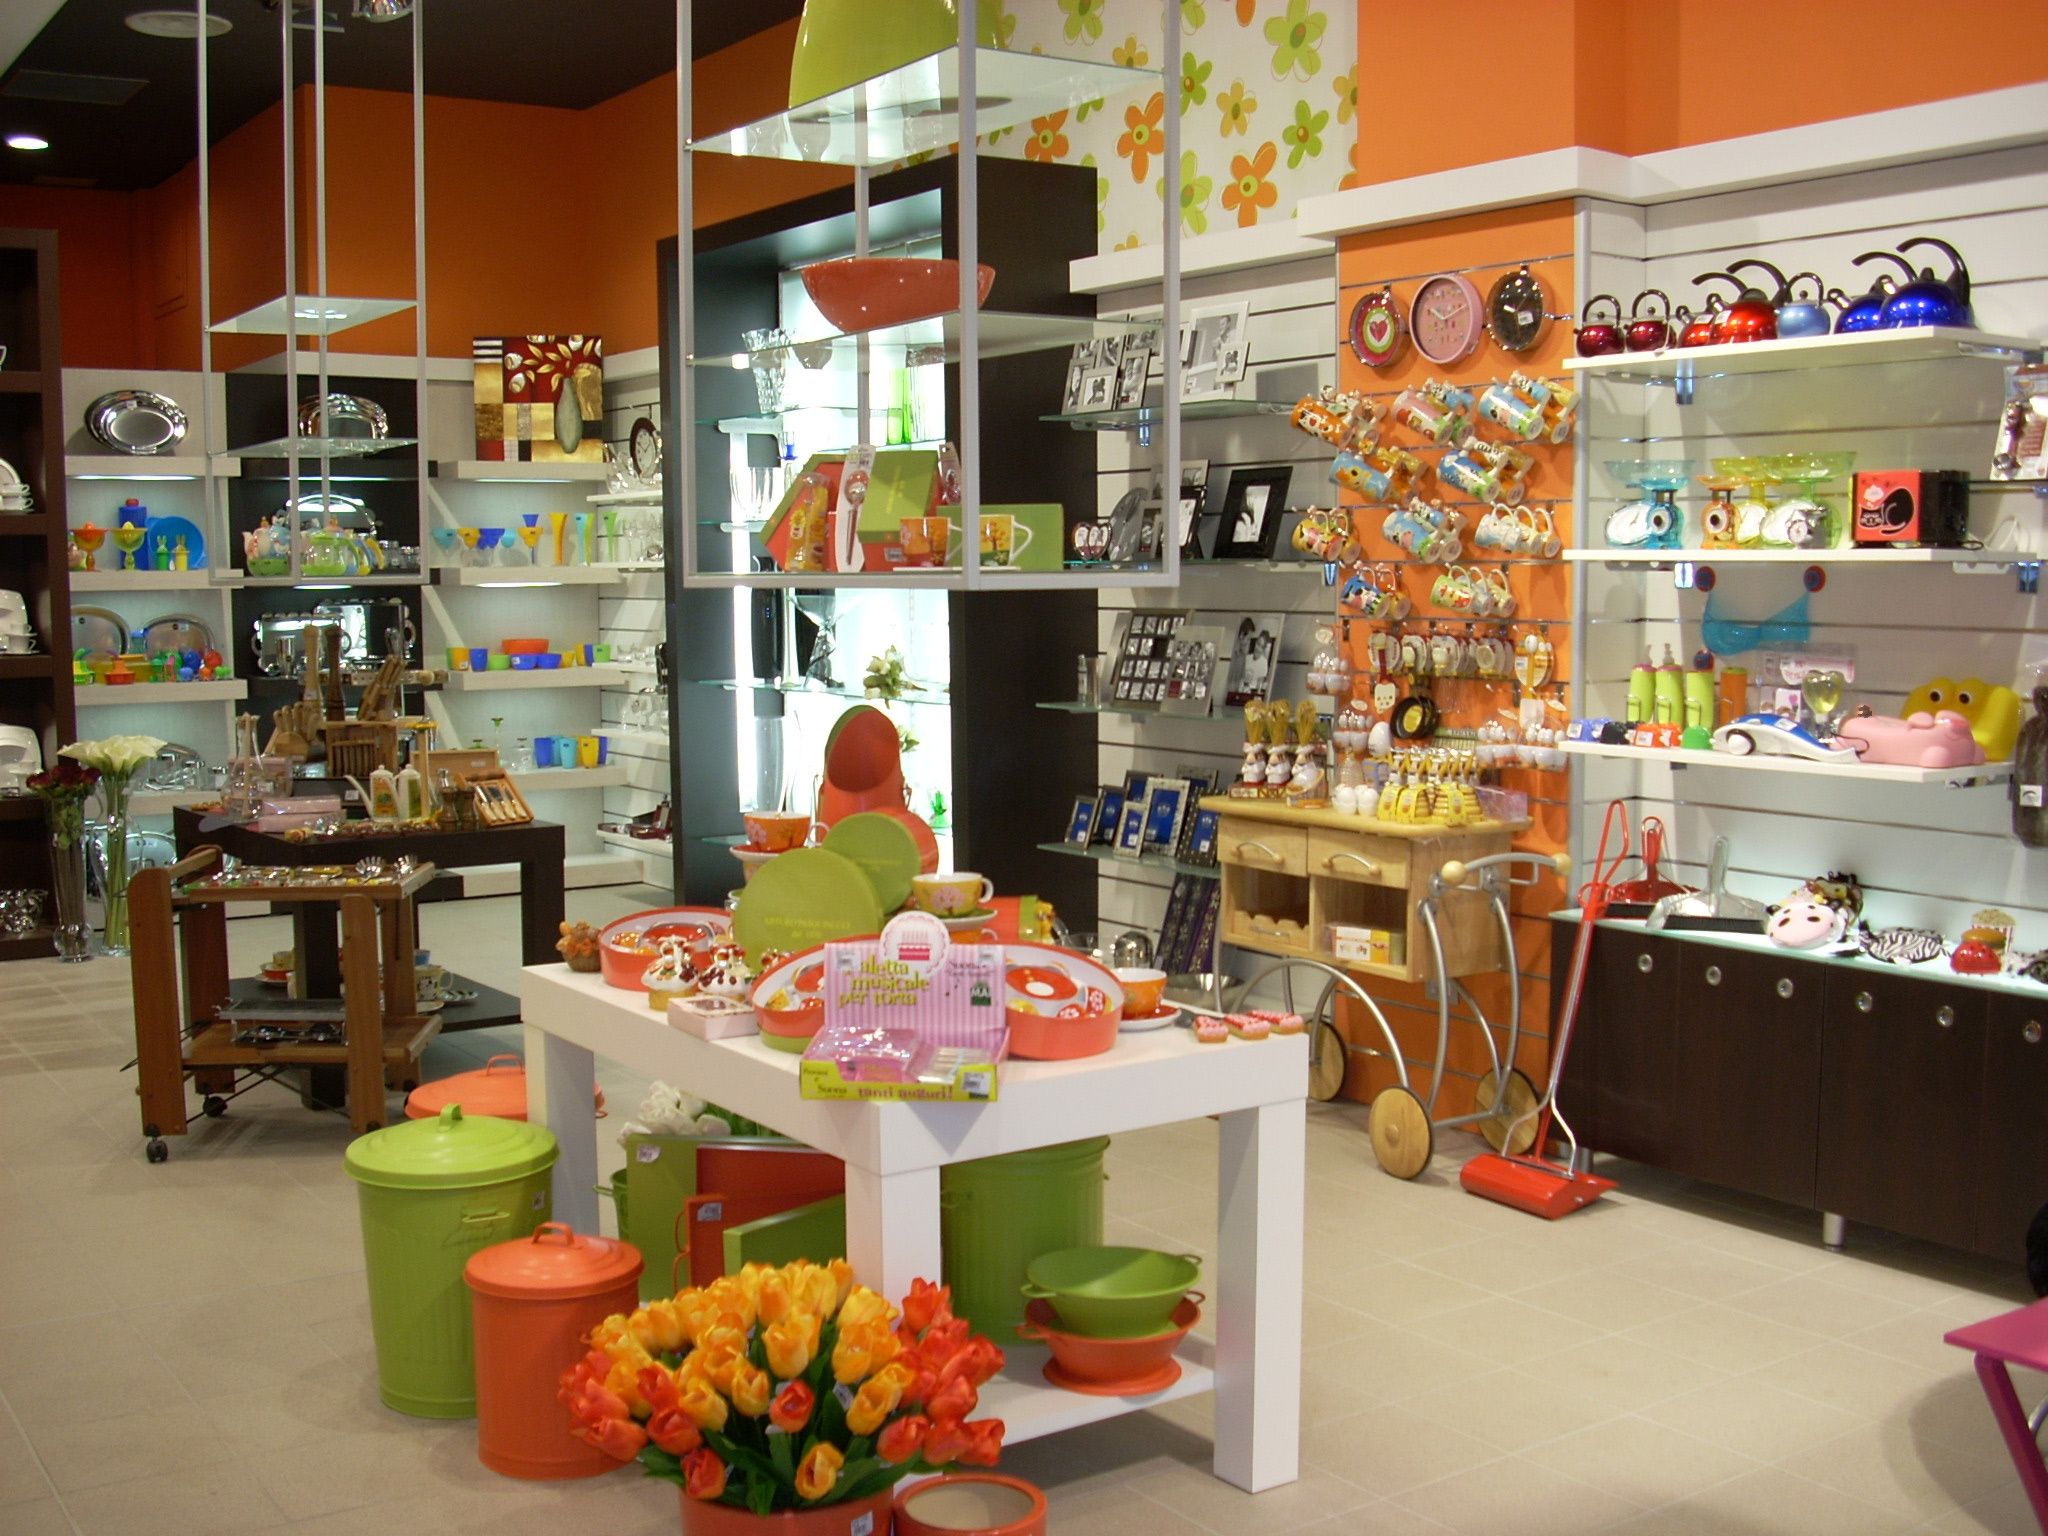 arredamento per negozi di articoli da regalo toscana belardi arredamenti